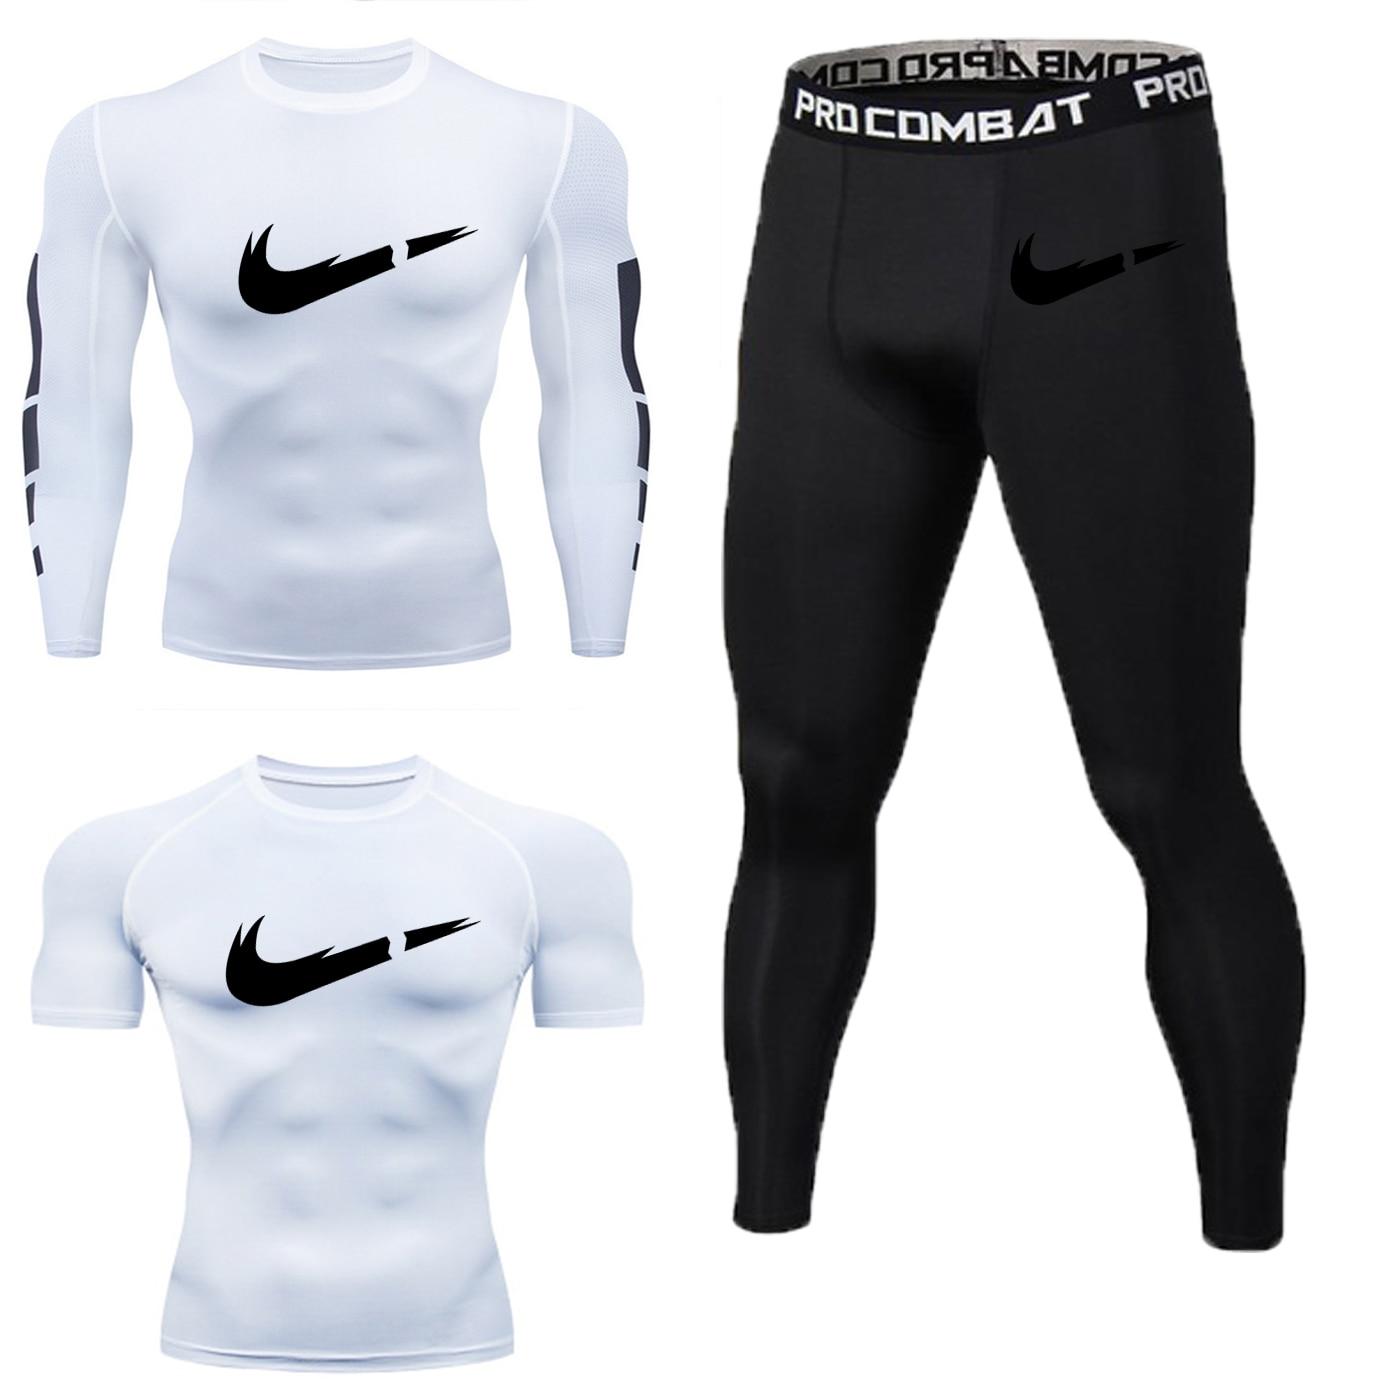 Full Set Of Men's Sportswear Fitness Sportswear Sportswear Running Jogging Sportswear Sportswear Sports Tights